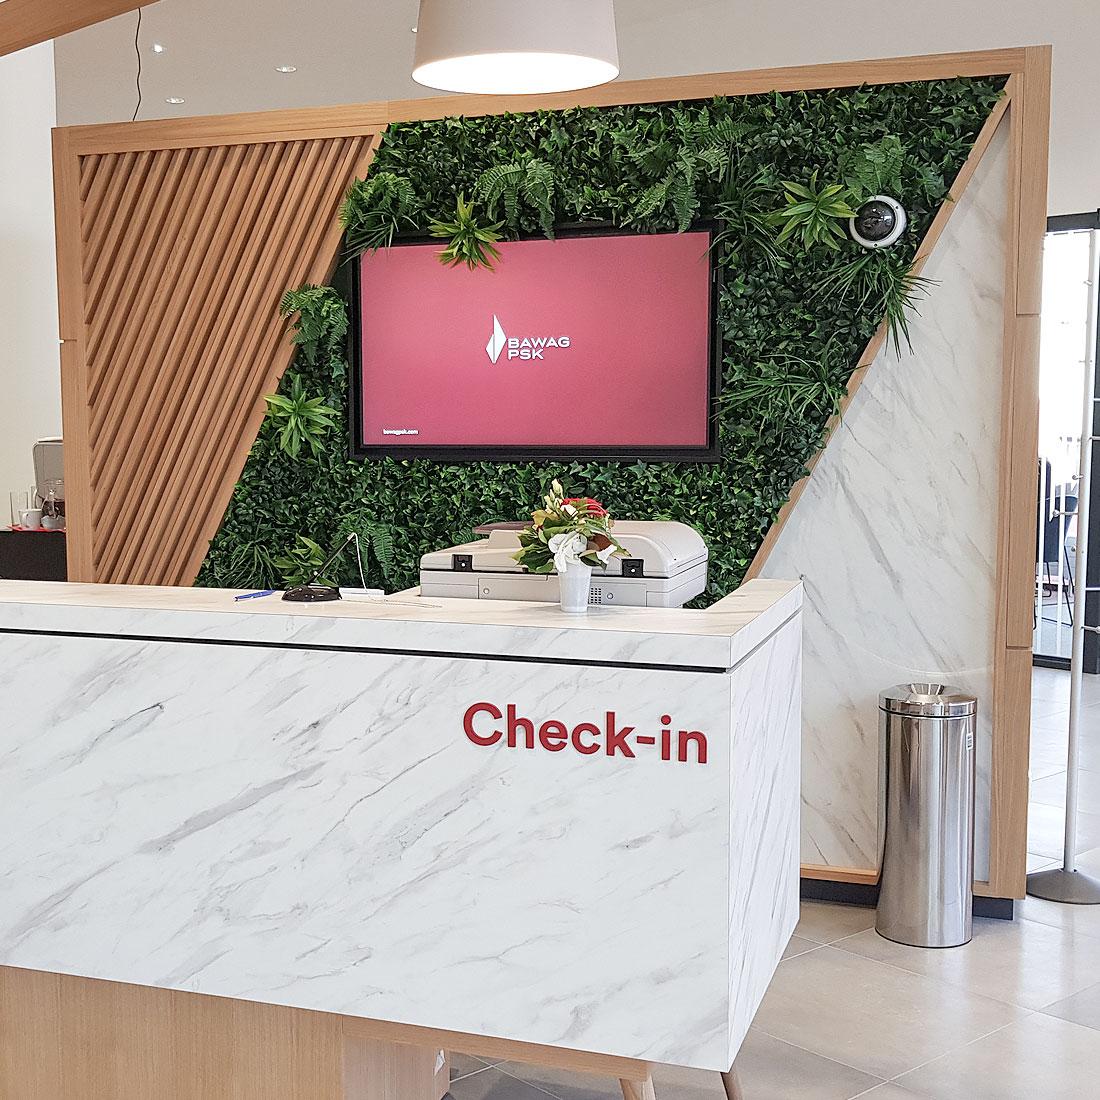 Digital Signage im Bankenumfeld - Bawag